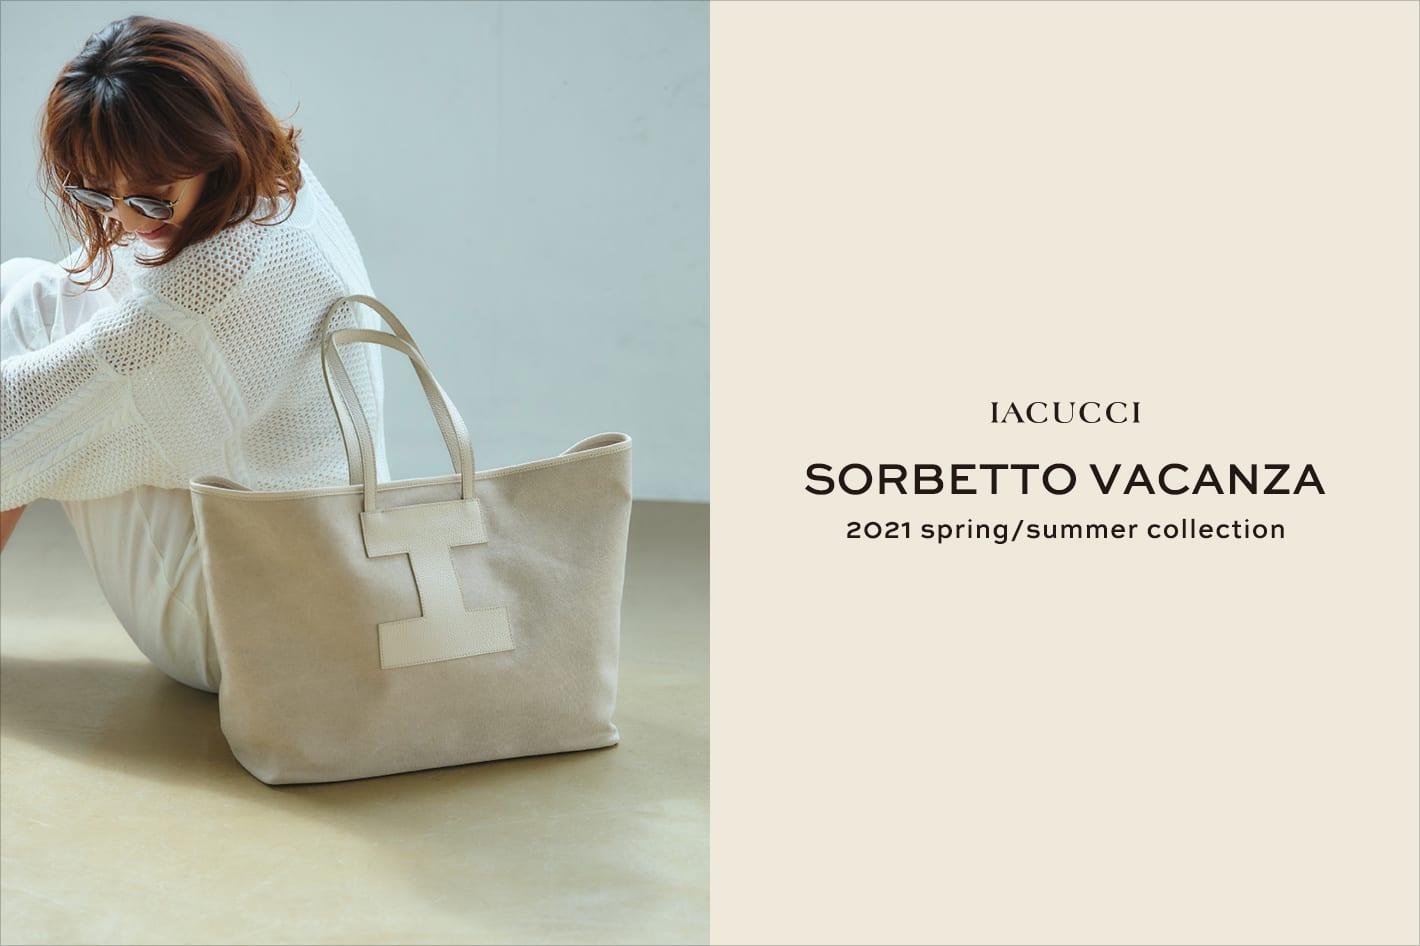 IACUCCI SORBETTO VACANZAが待望の通常販売スタート!